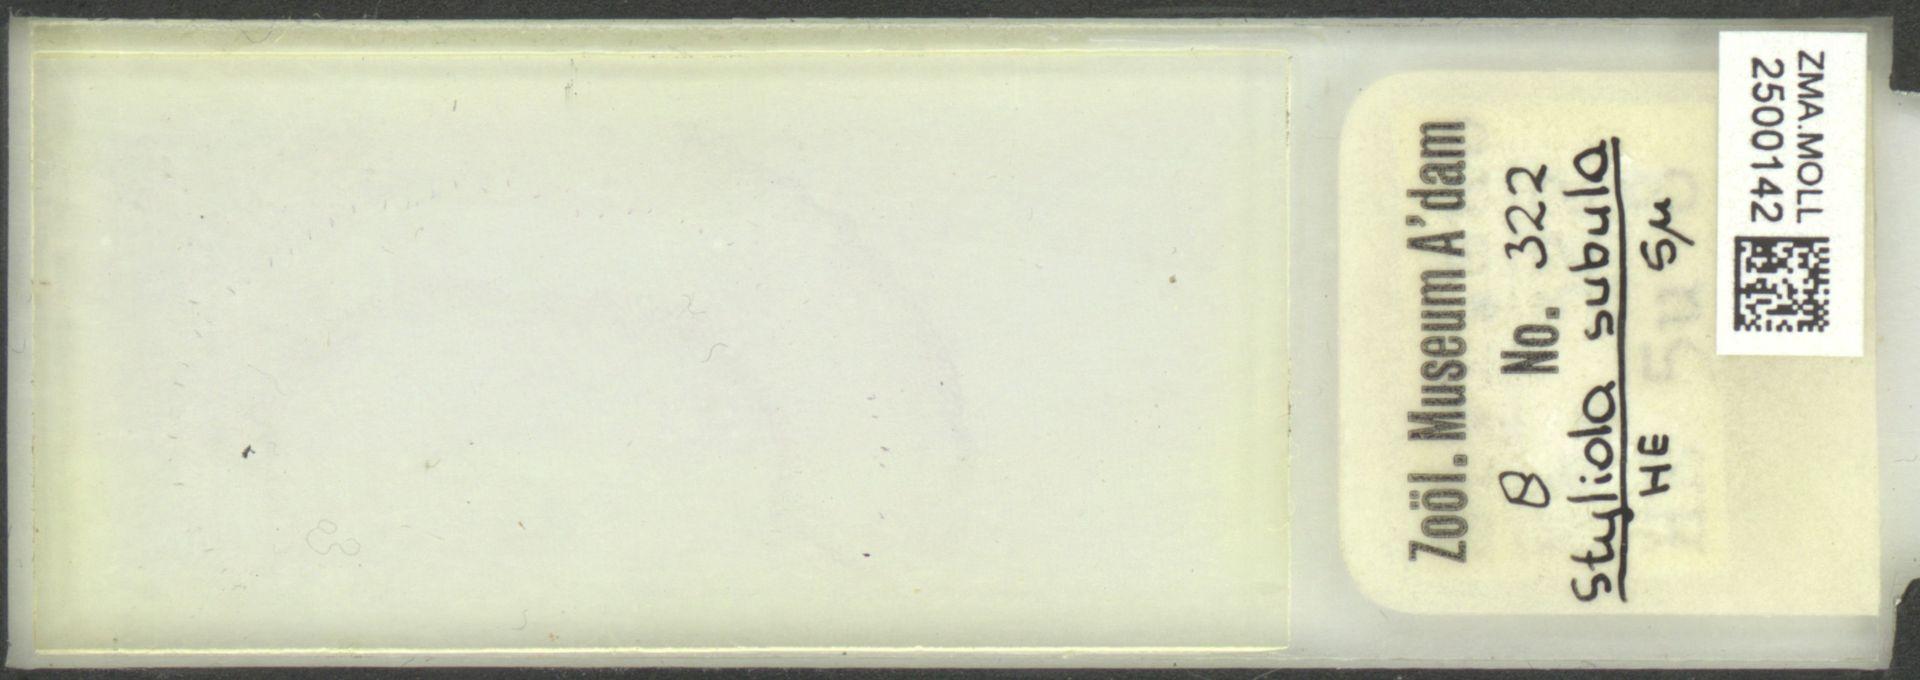 ZMA.MOLL.2500142 | Styliola subula (Quoy & Gaimard, 1827)